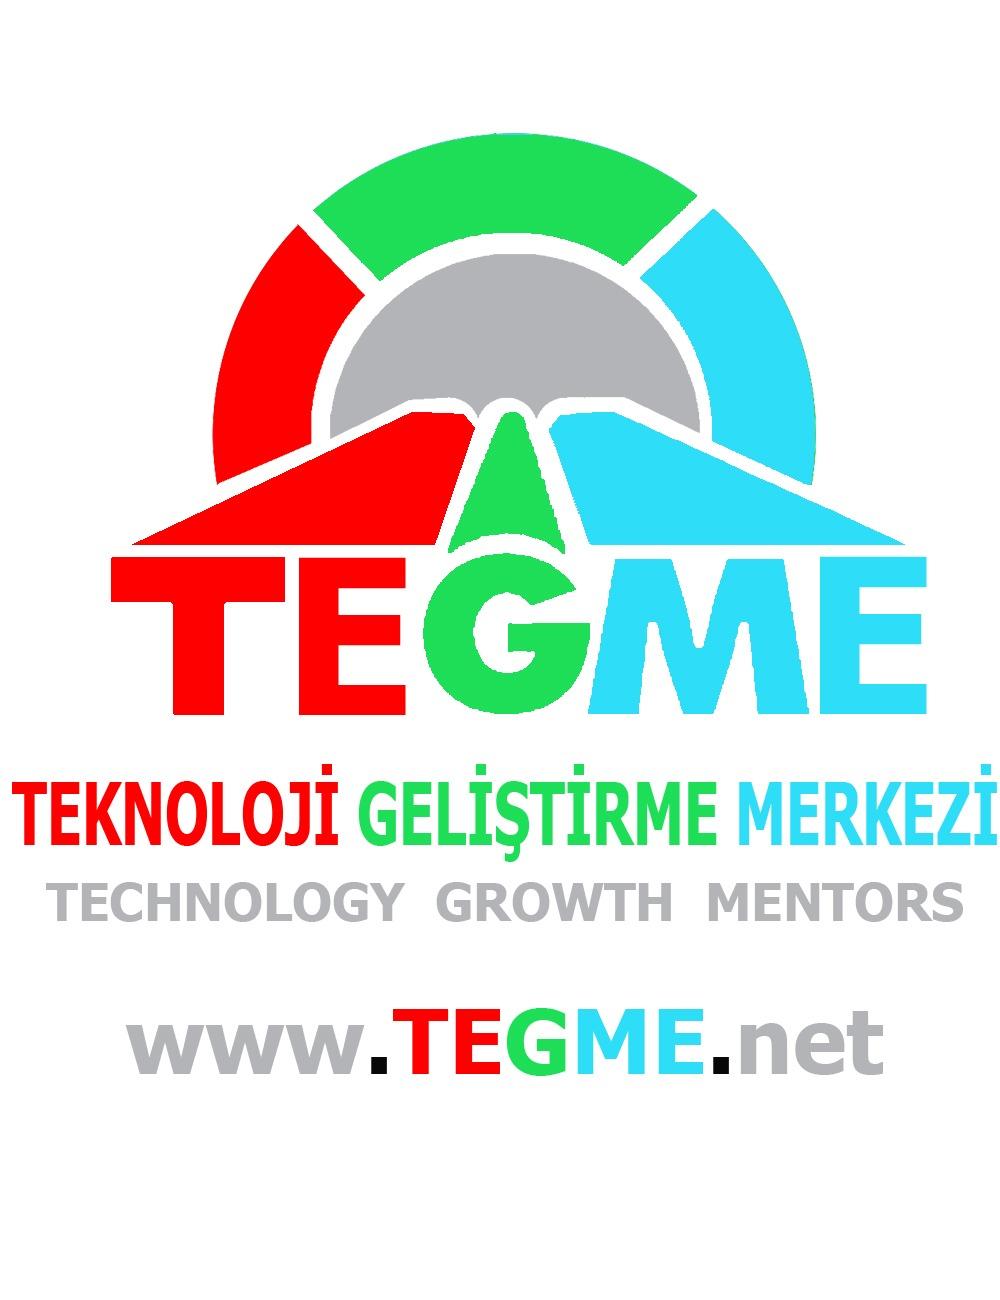 TEGME - TEKNOLOJİ GELİŞTİRME MERKEZİ - TECHNOLOGY GROWTH MENTORS - www.tegme.net / sümeyra kaymakçı